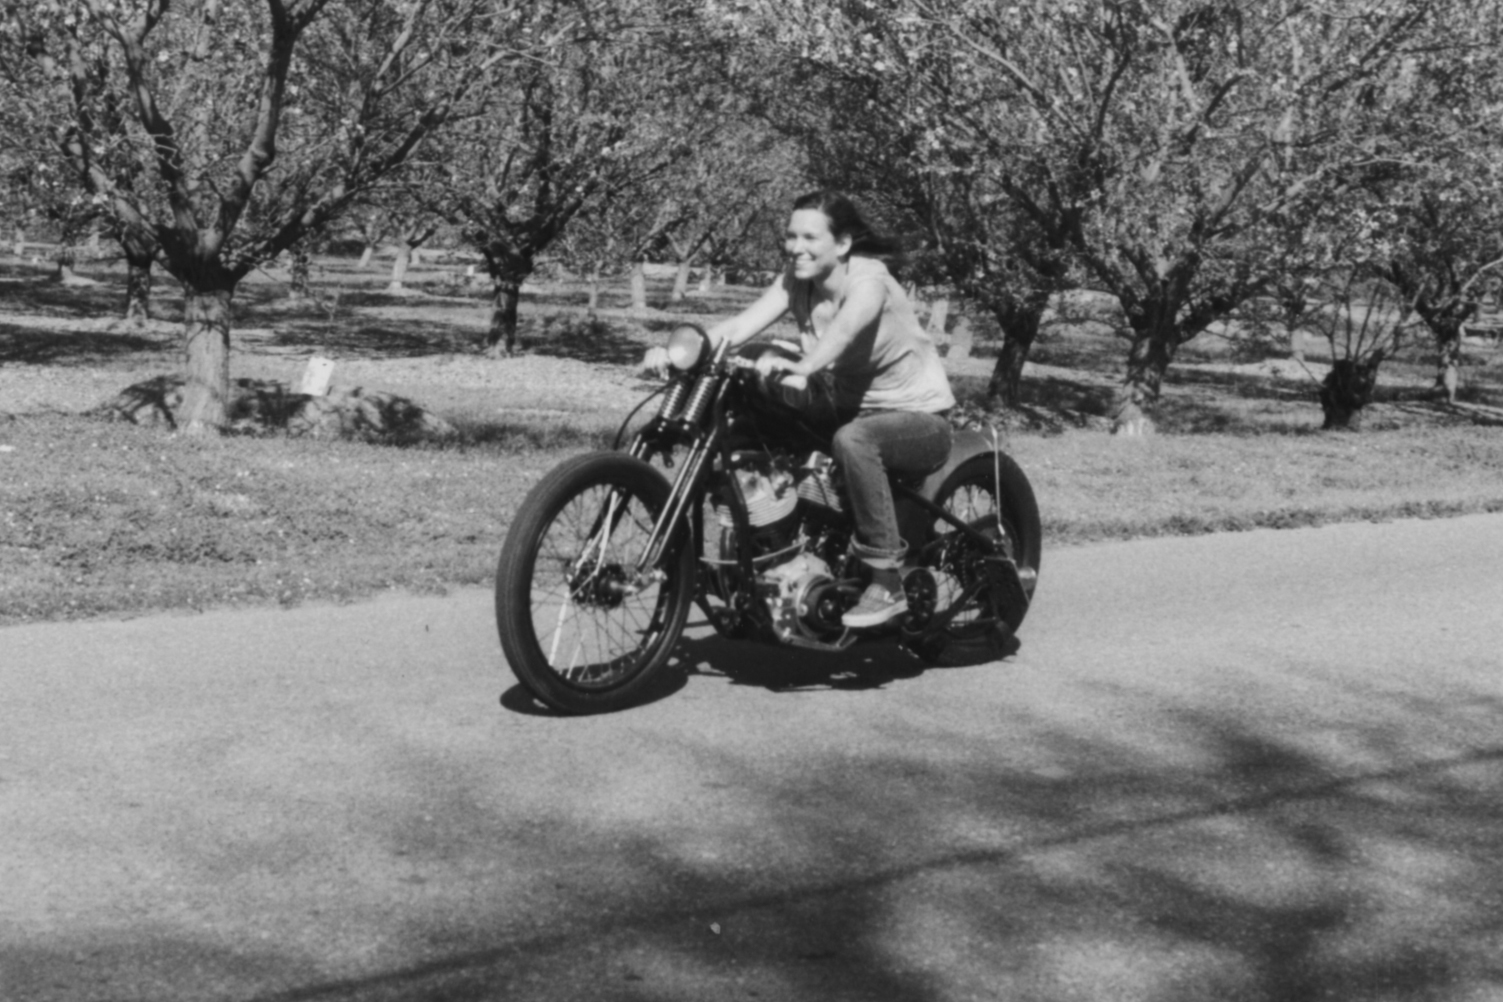 Photo & motorbike property of  Scott Pommier